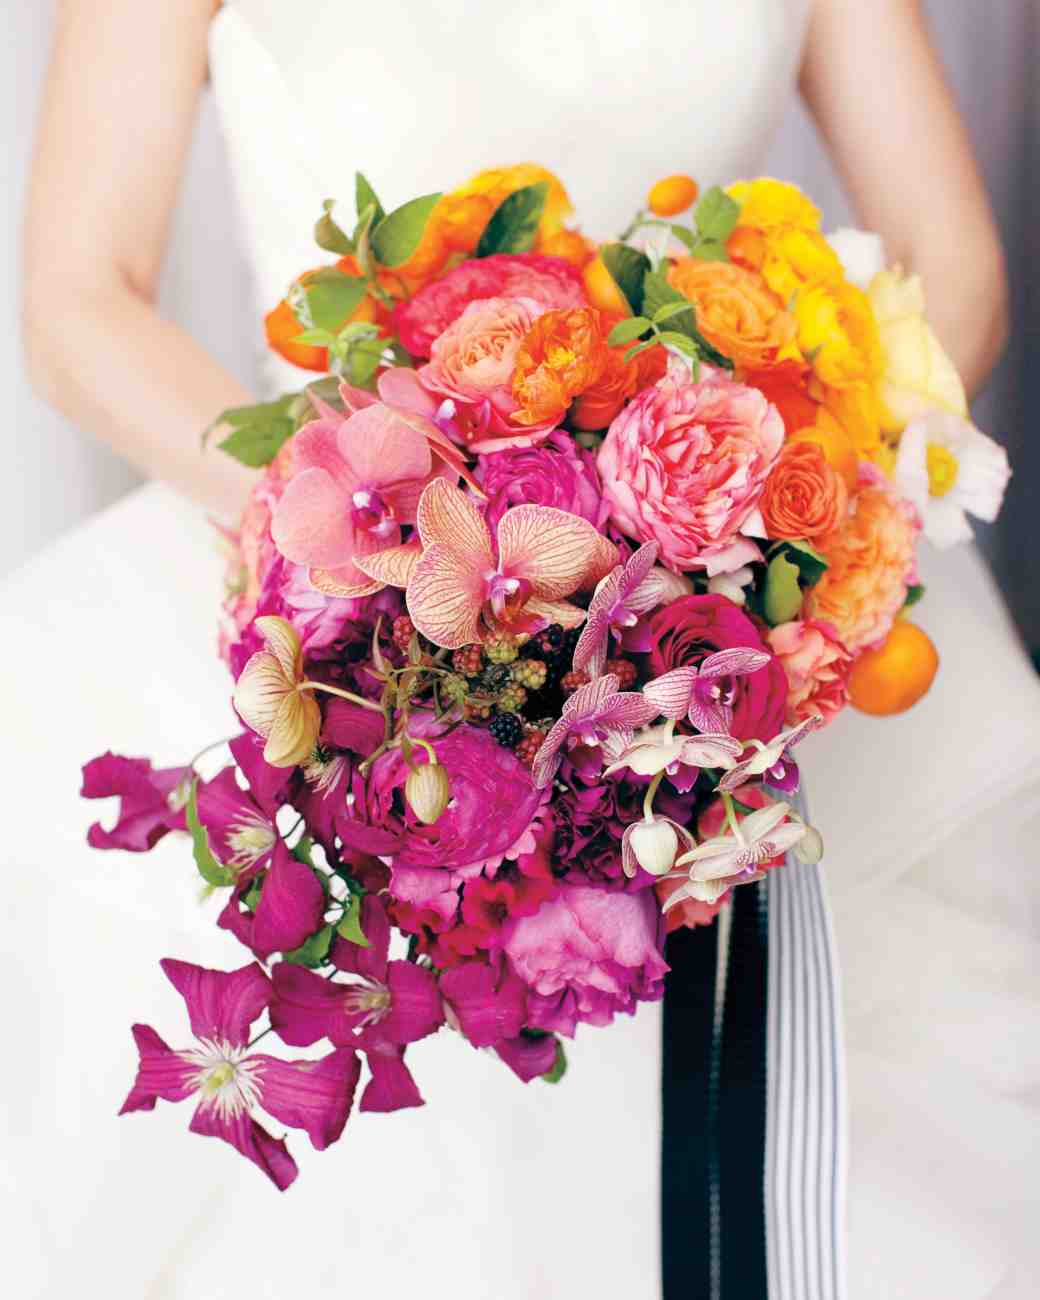 Garden roses tea roses poppies kumquats tangerines for Wedding bouquets